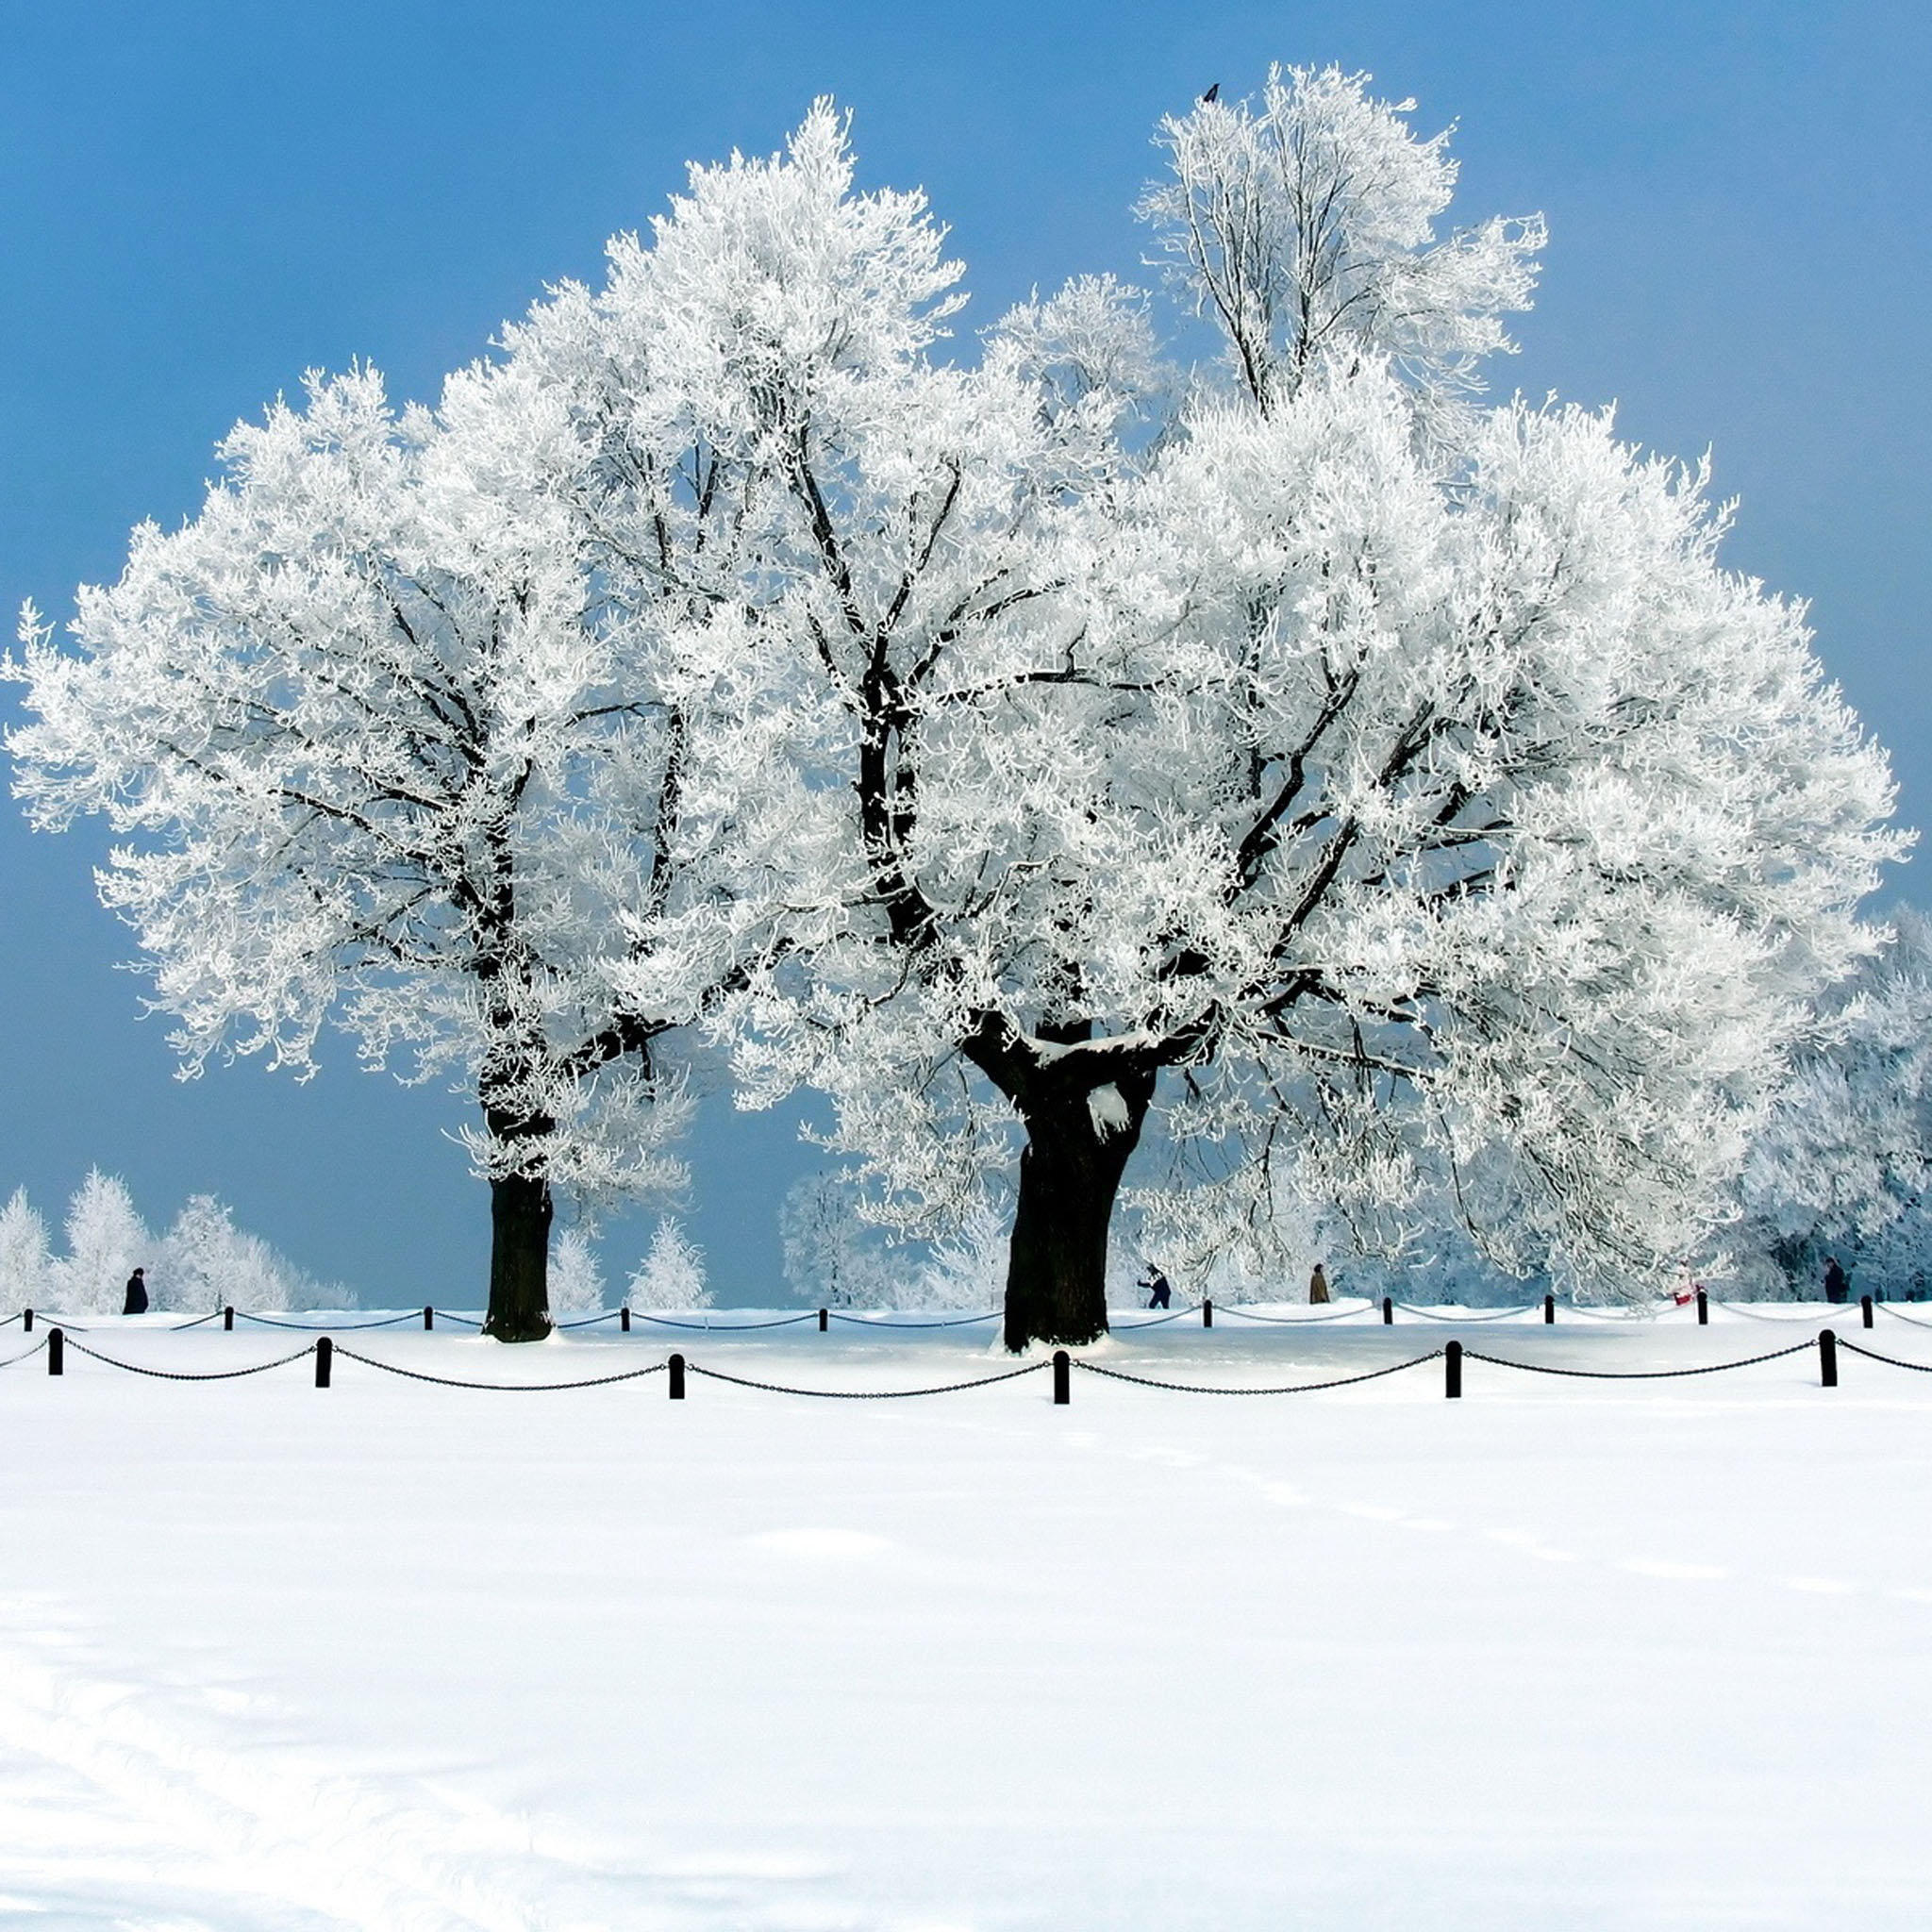 iPad Wallpapers Beautiful winter snow scenes   Natural Scenery New 2048x2048